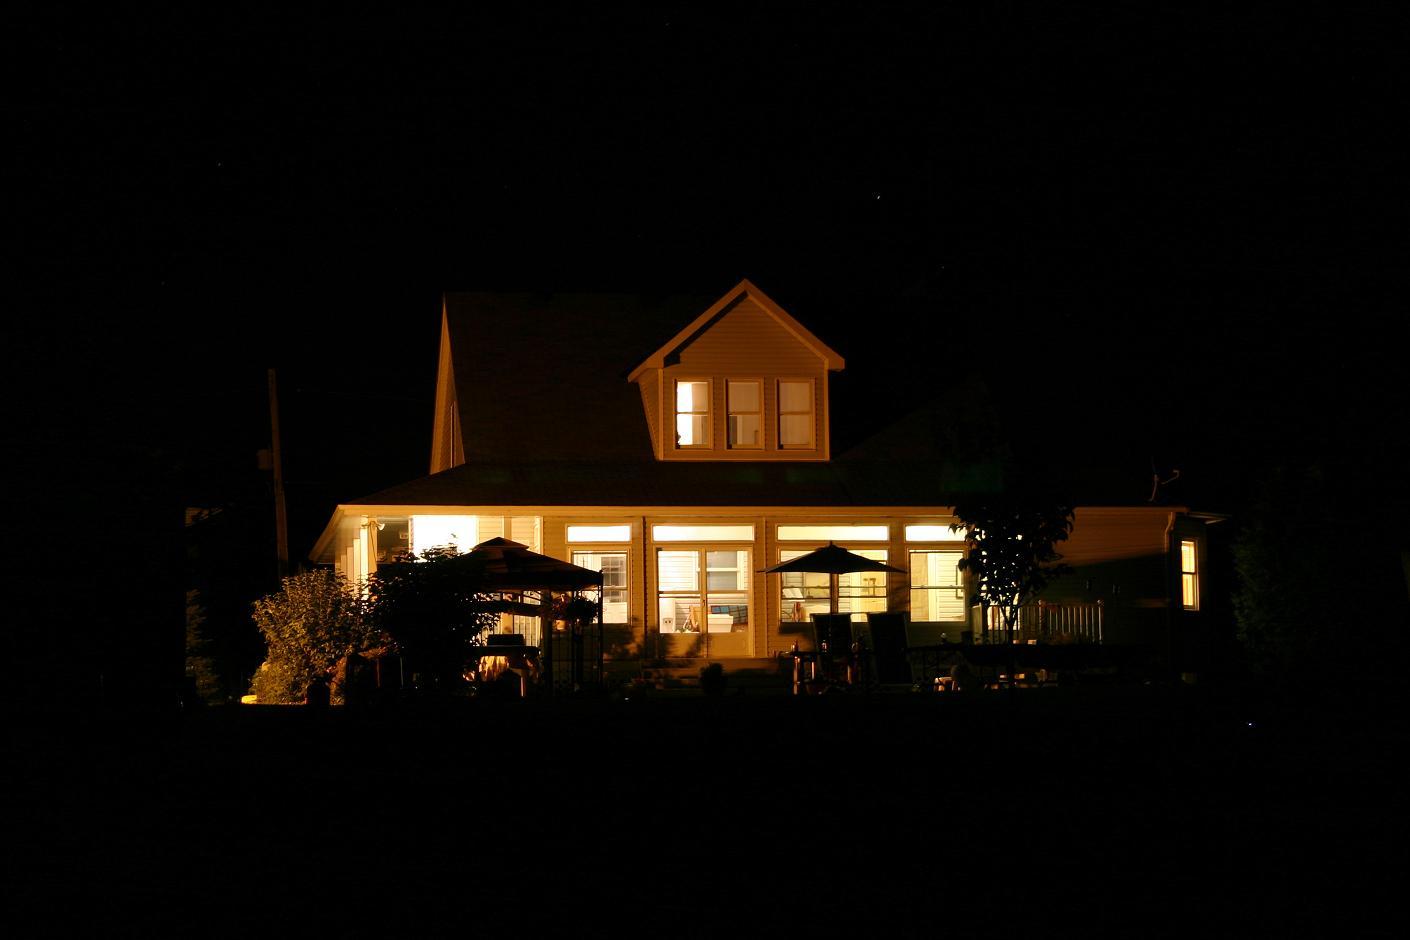 Nice House at Night | My Uncles house near Ottawa at night ...